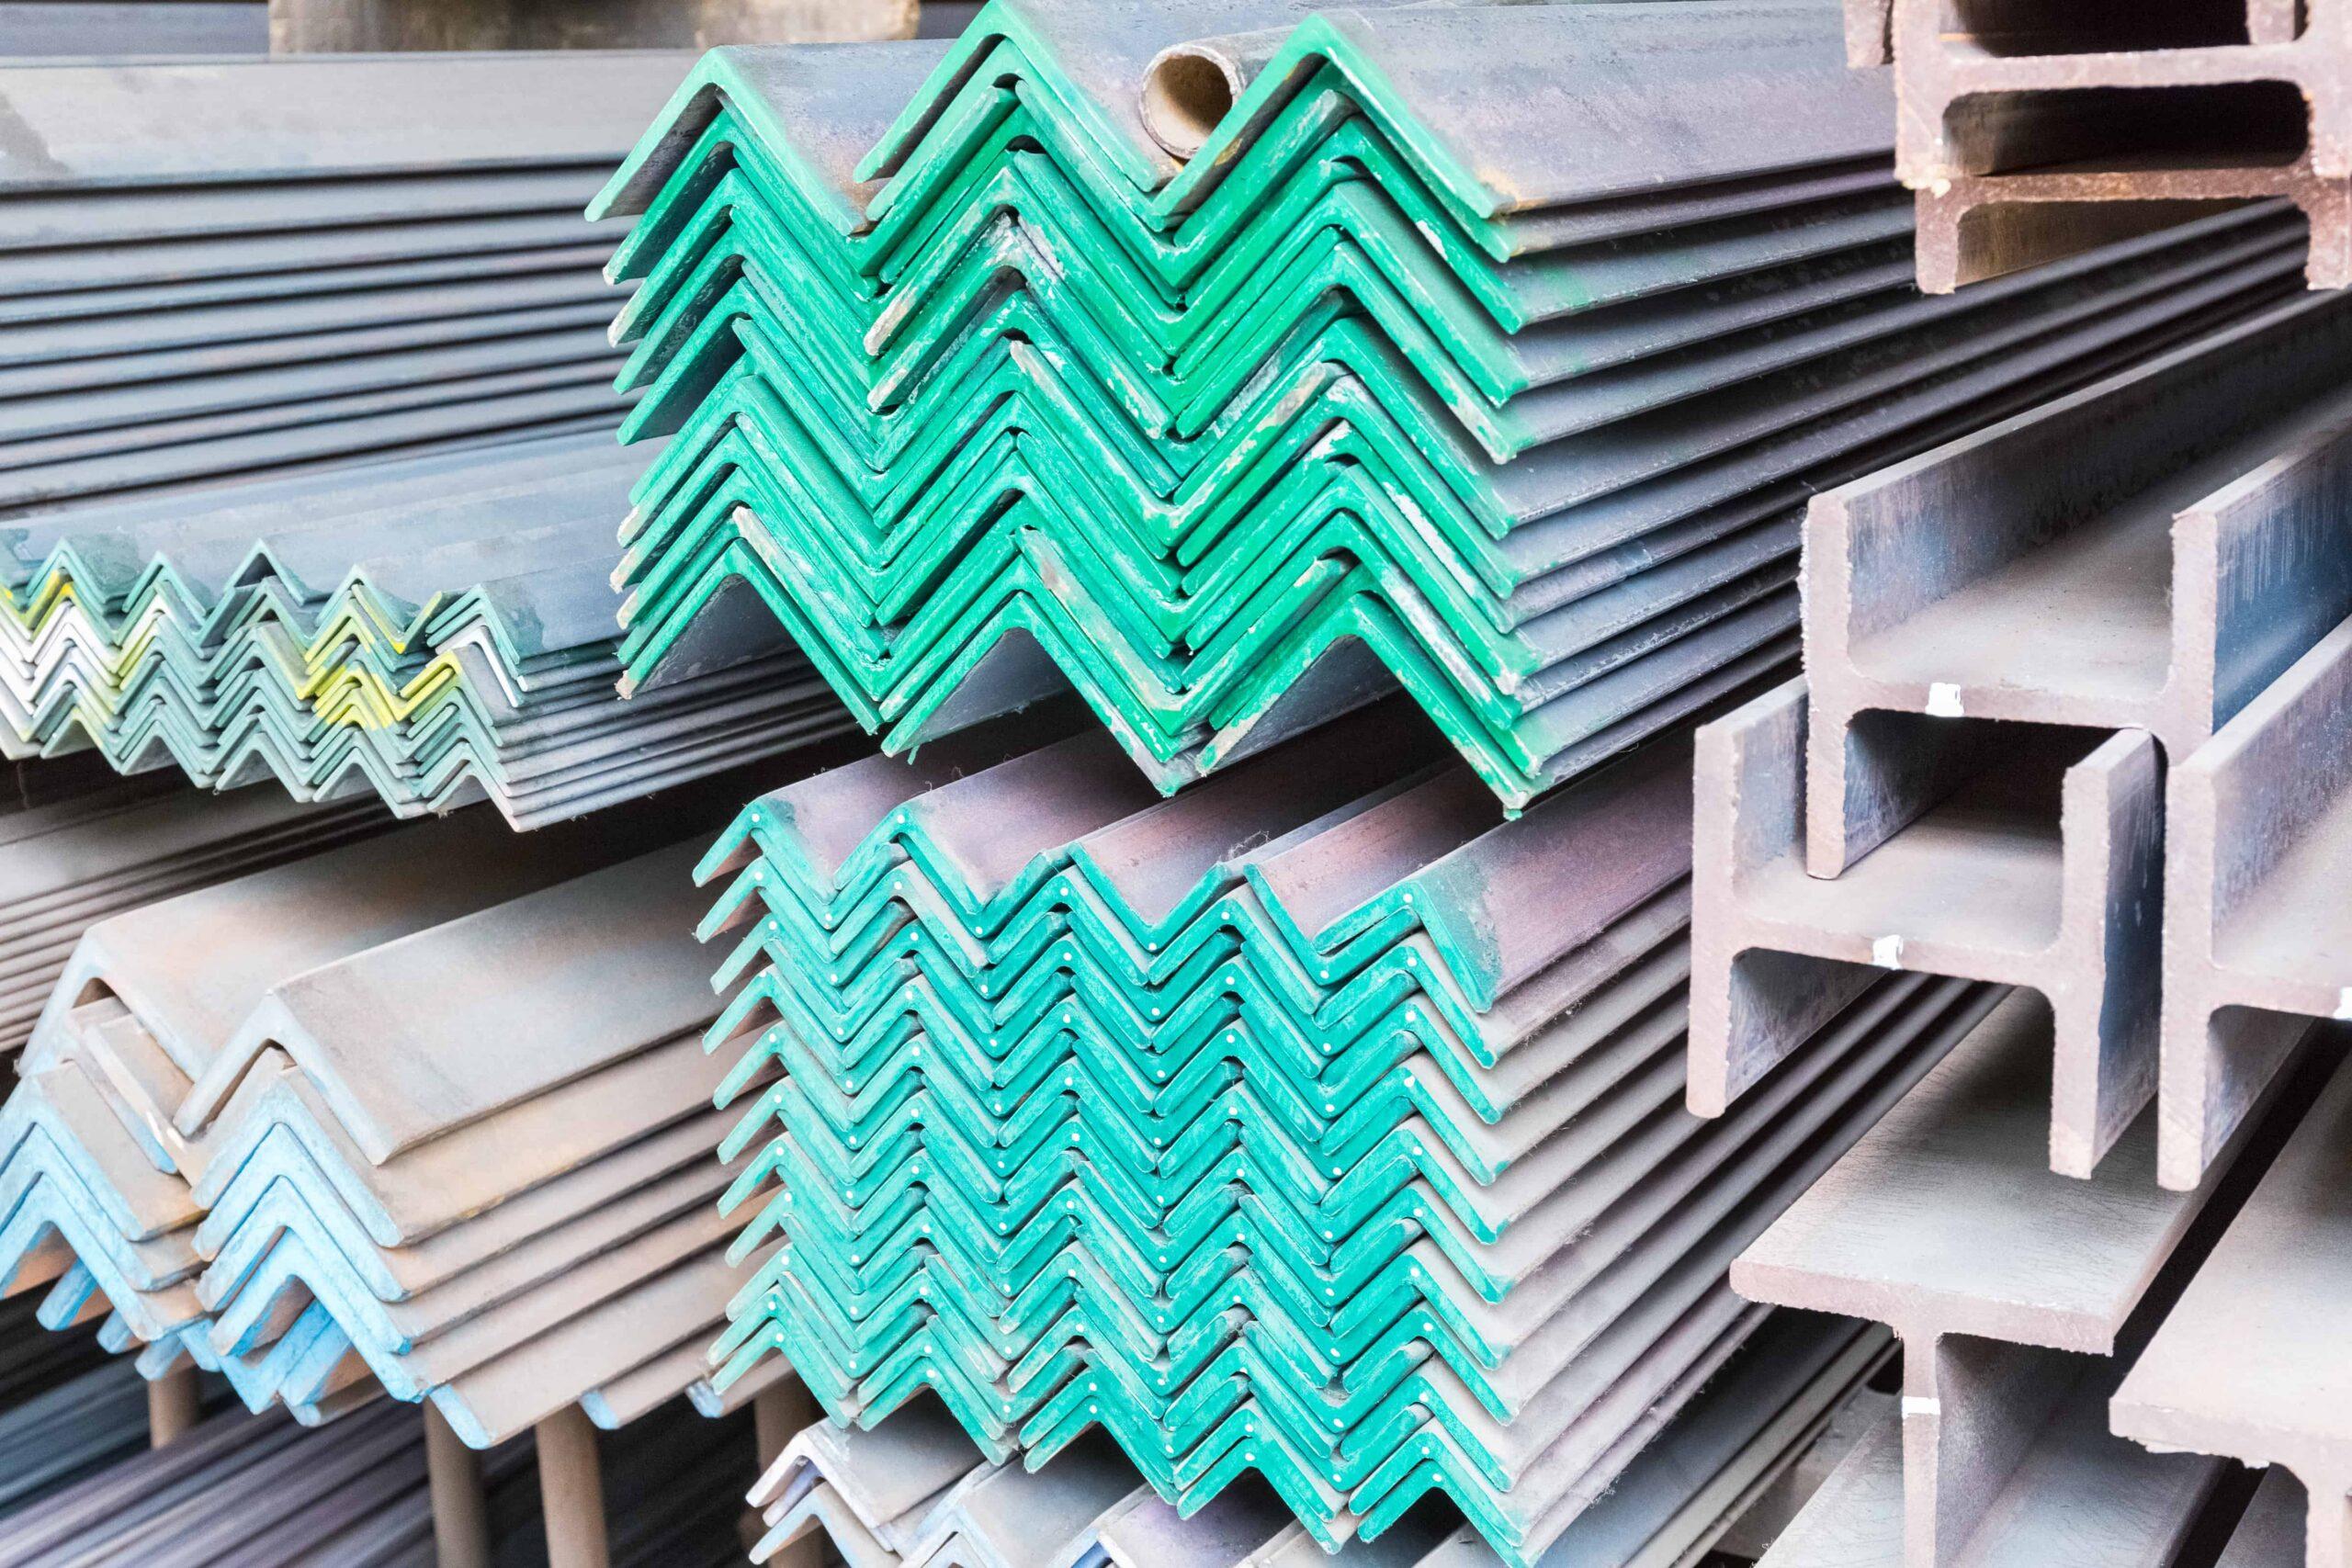 The Umbrella Of Iron & Steel Industry